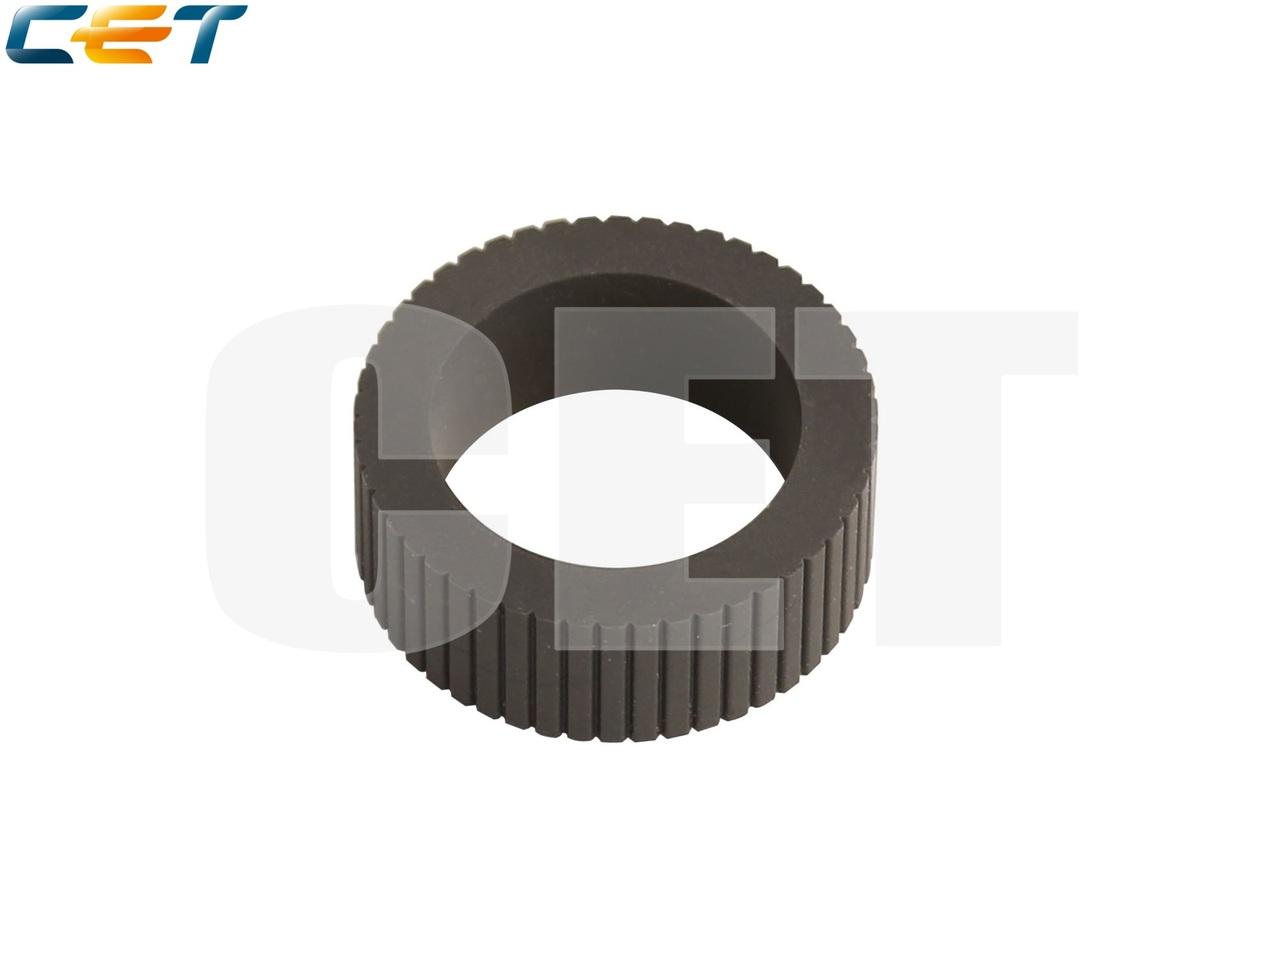 Резинка ролика подхвата PA03540-0002 для FUJITSUfi-2310/6230 (CET), CET341017